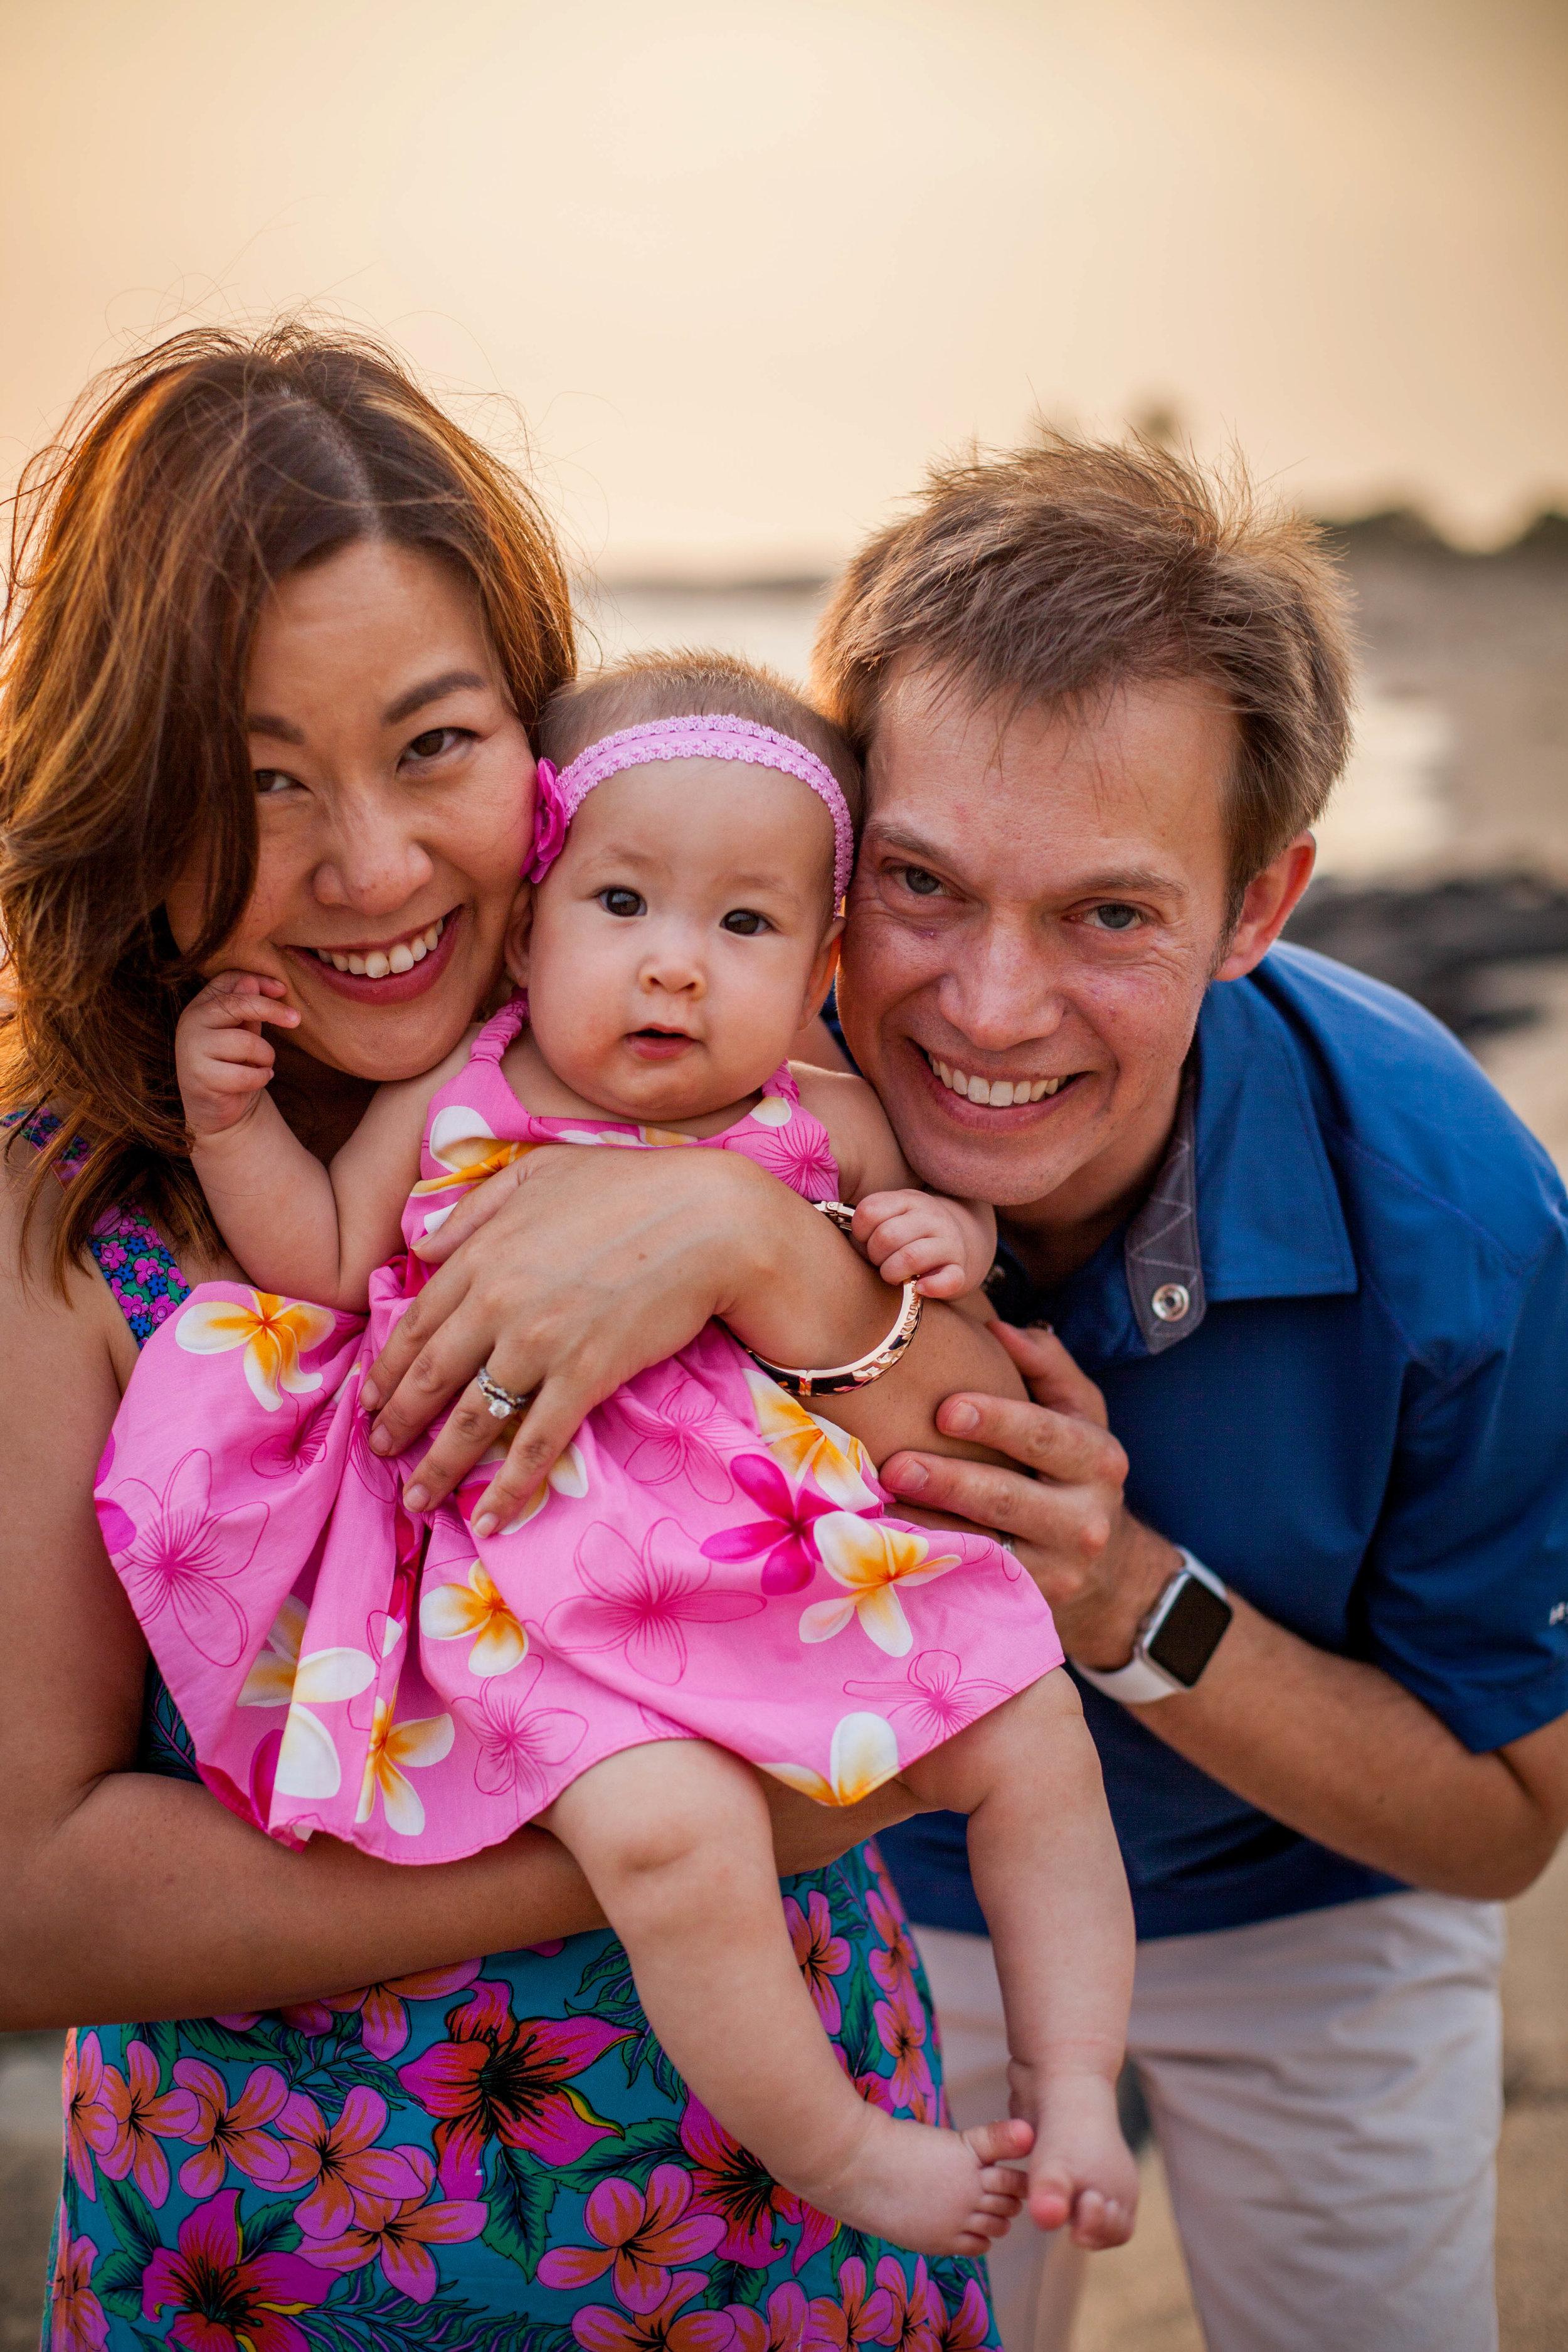 big island hawaii old kona airport beach family © kelilina photography 20170405181106.jpg